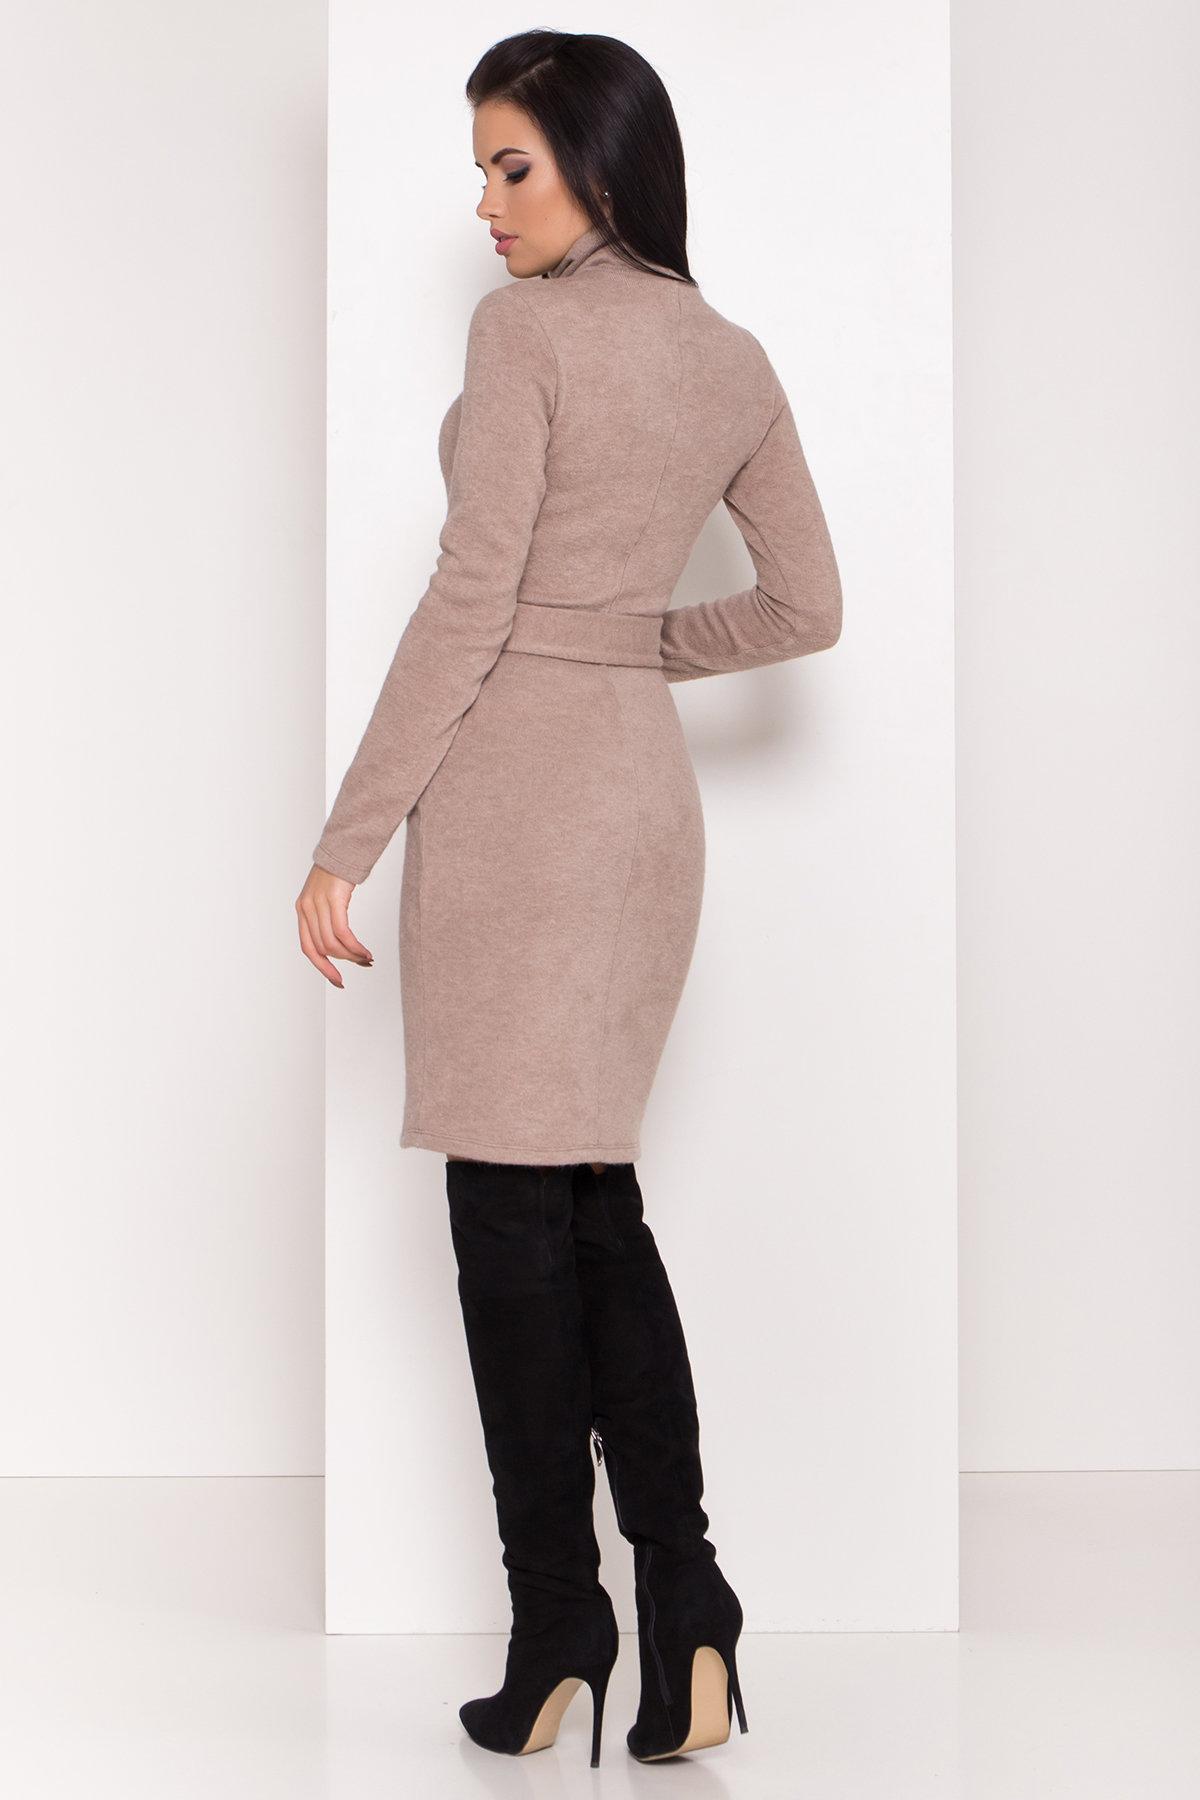 Платье из ангоры Вери 8258 Цвет: бежевый